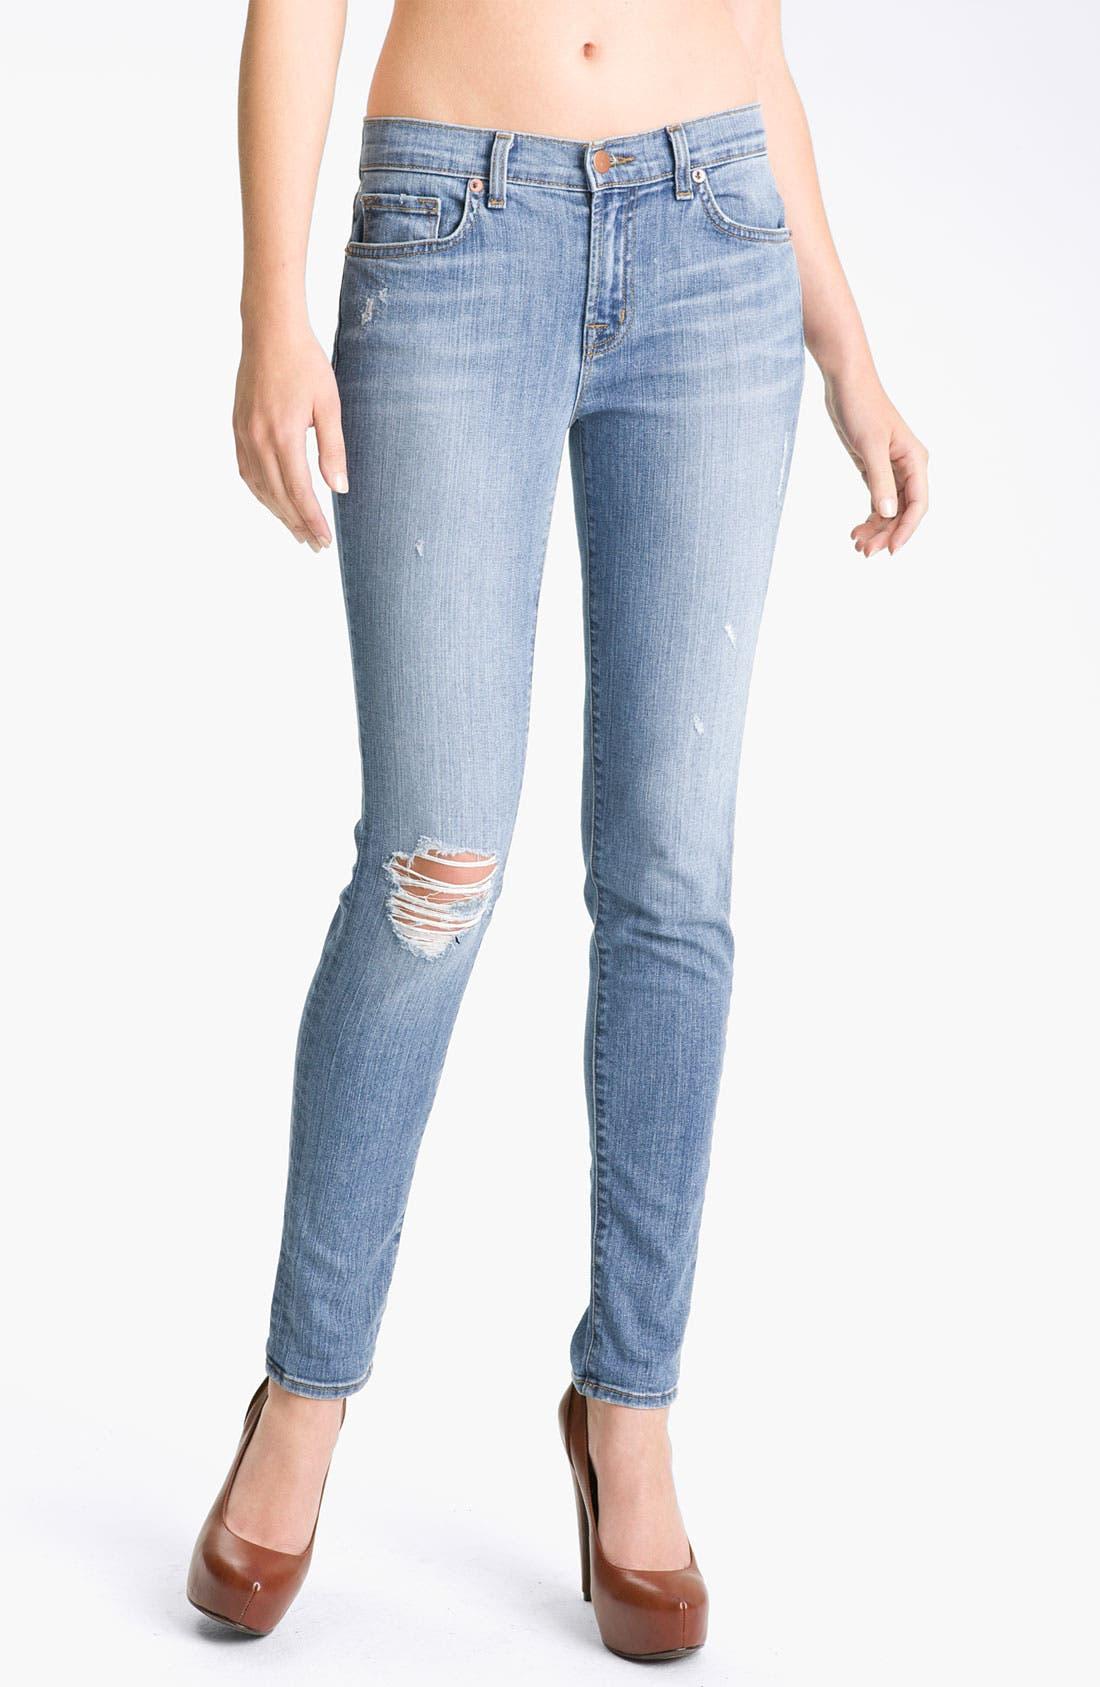 Alternate Image 1 Selected - J Brand Skinny Stretch Jeans (Tulum)